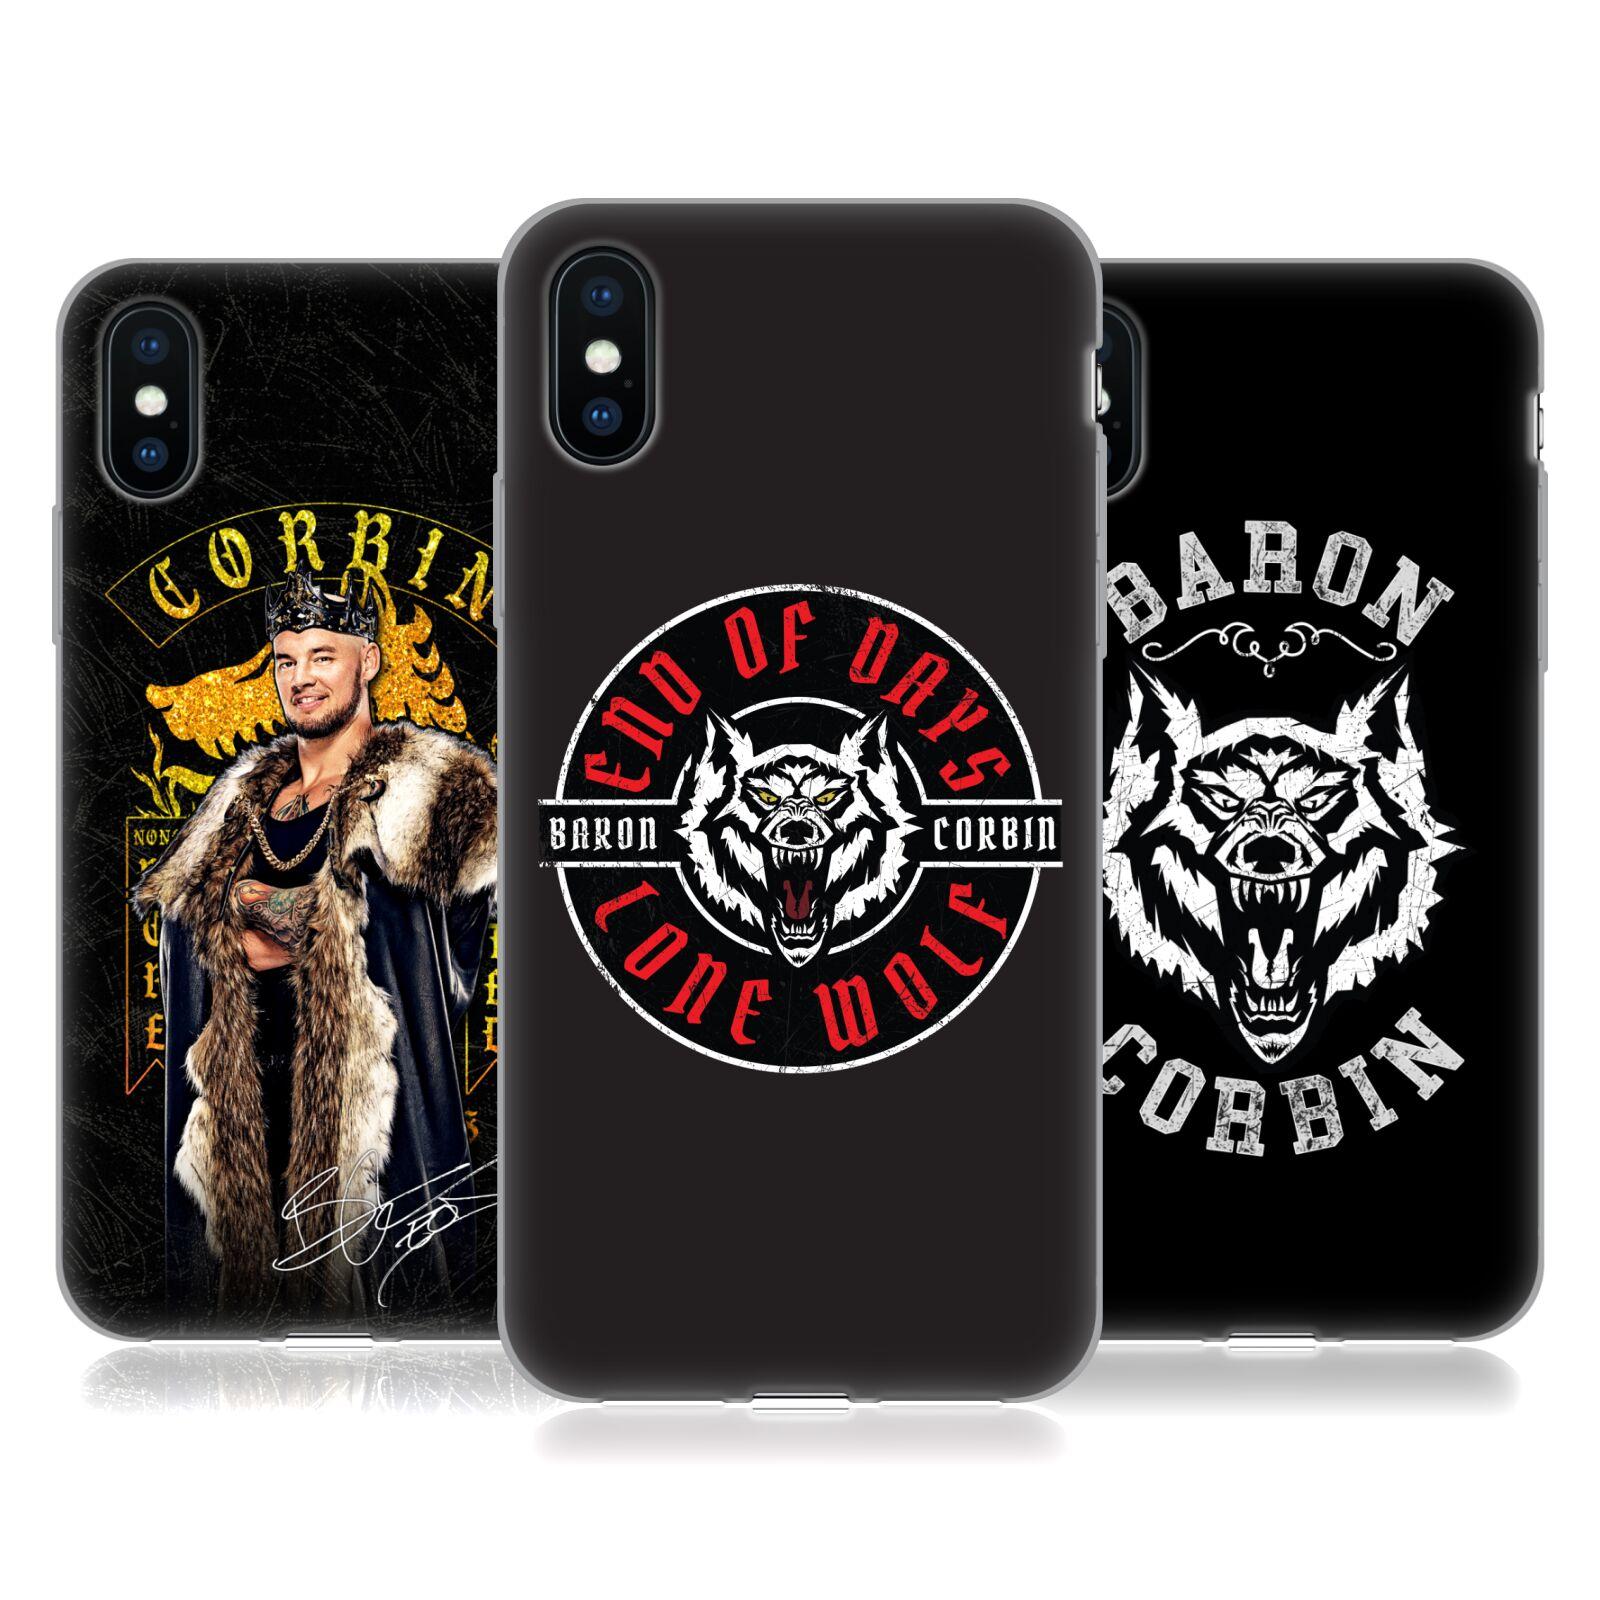 WWE <!--translate-lineup-->Baron Corbin<!--translate-lineup-->